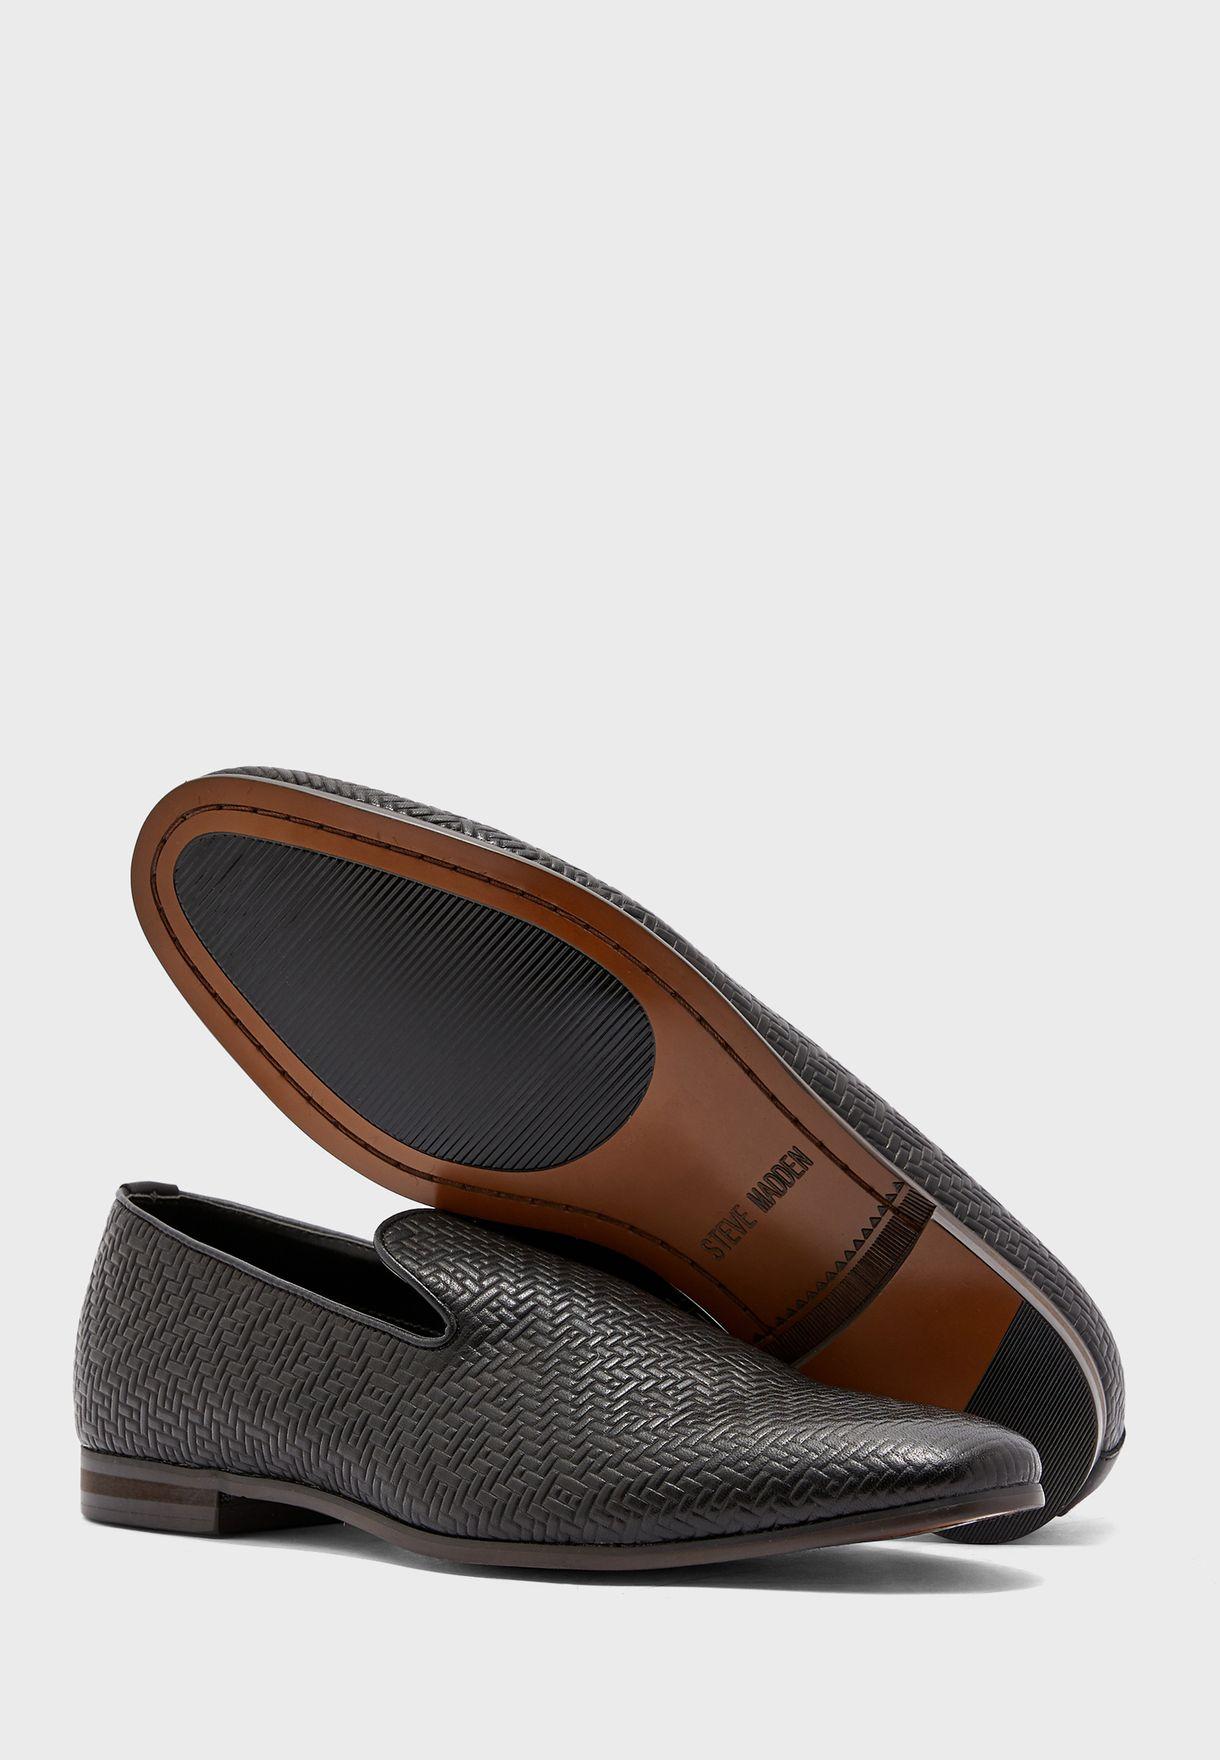 Dieggo Loafers